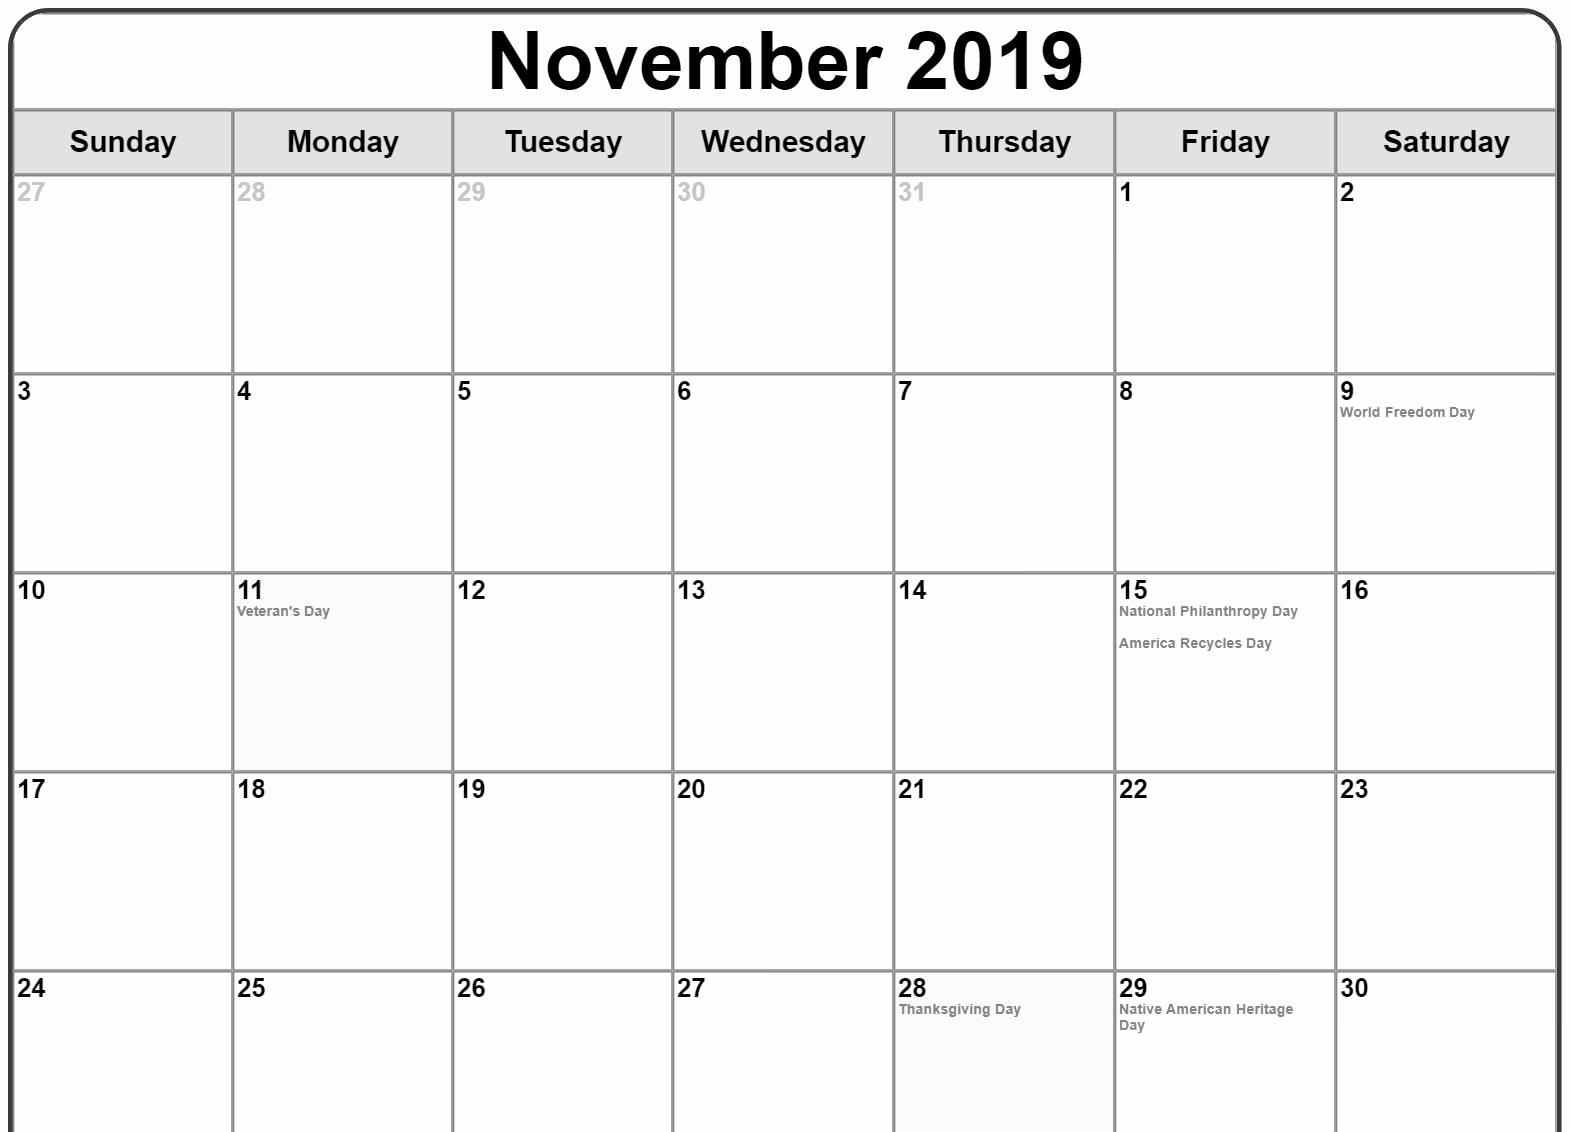 November 2019 Calendar With Holidays Printable